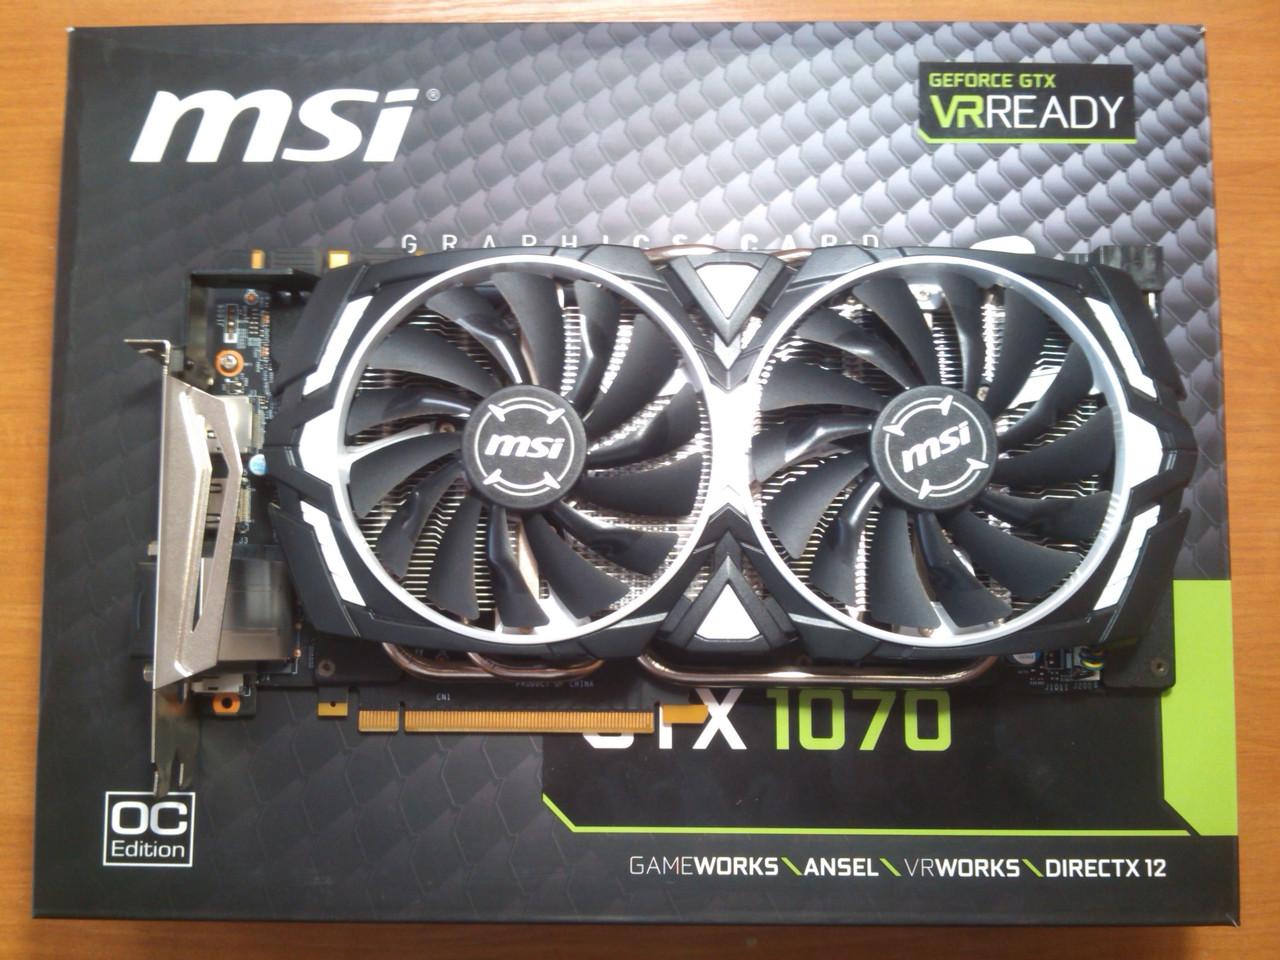 MSI GTX 1070 ARMOR OC 8GB 256bit GDDR5 HDMI PCI-E Гарантія!